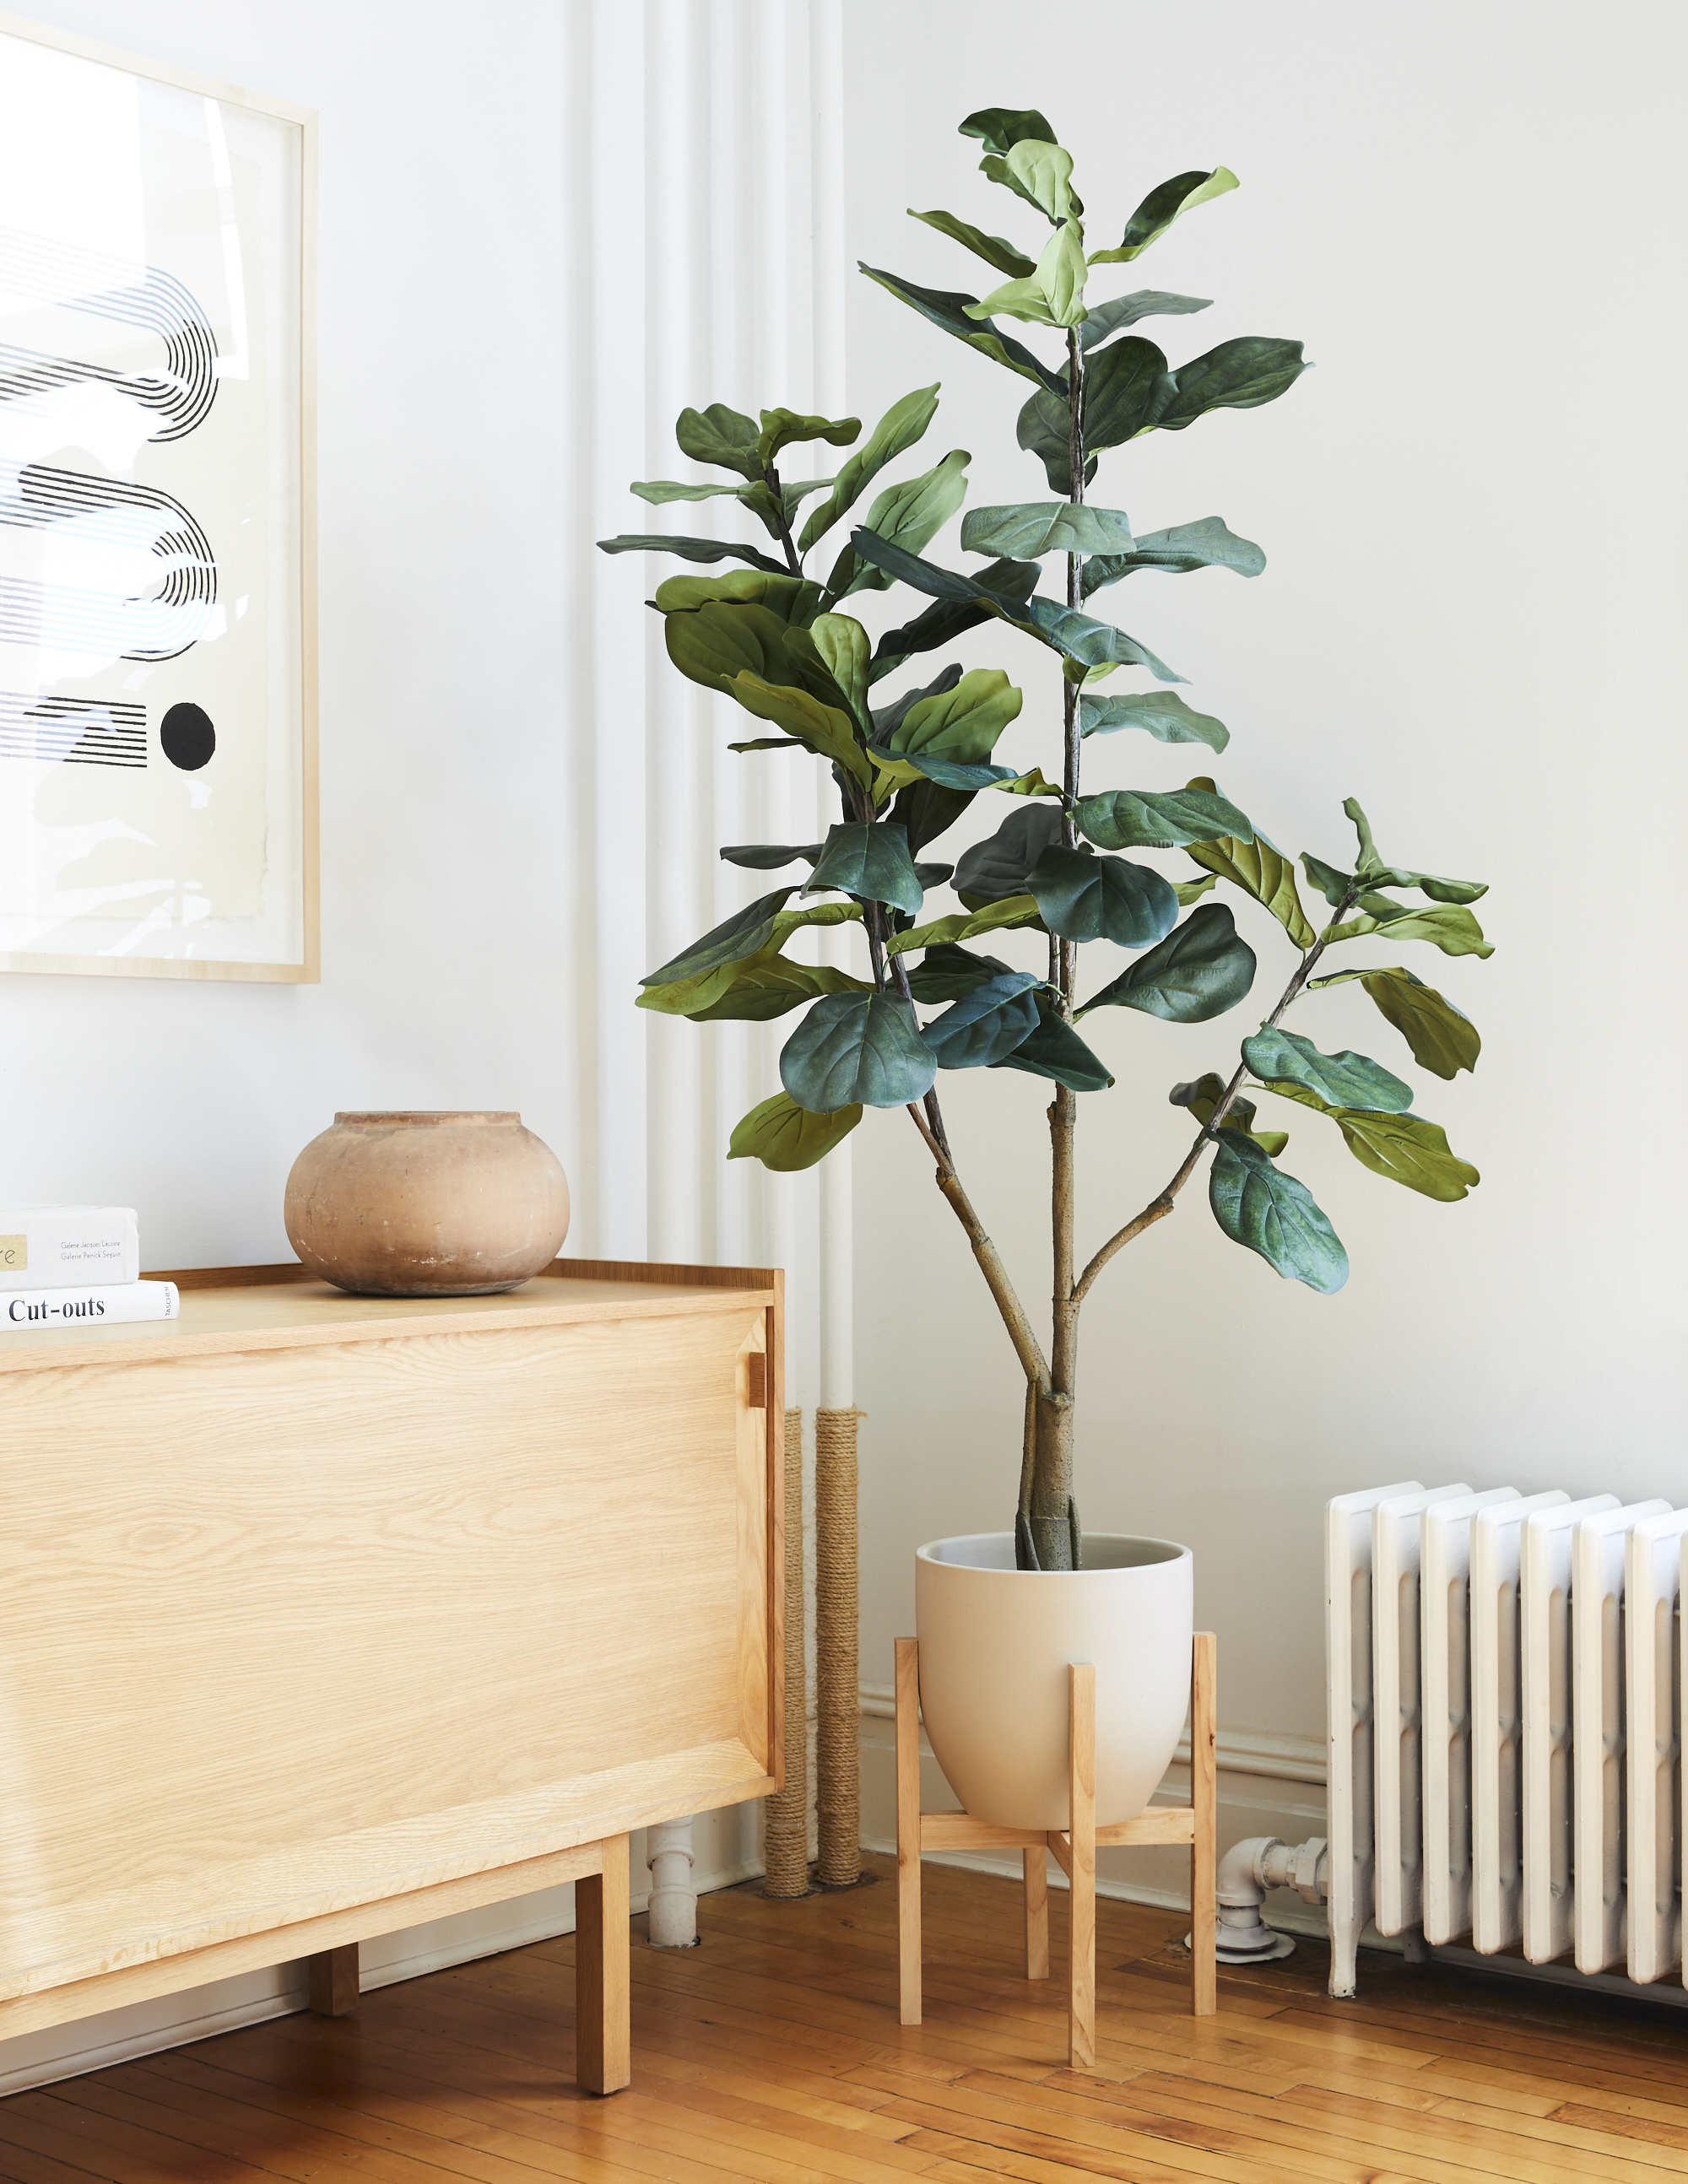 Fiddle Leaf Fig Plant, Jute Pot